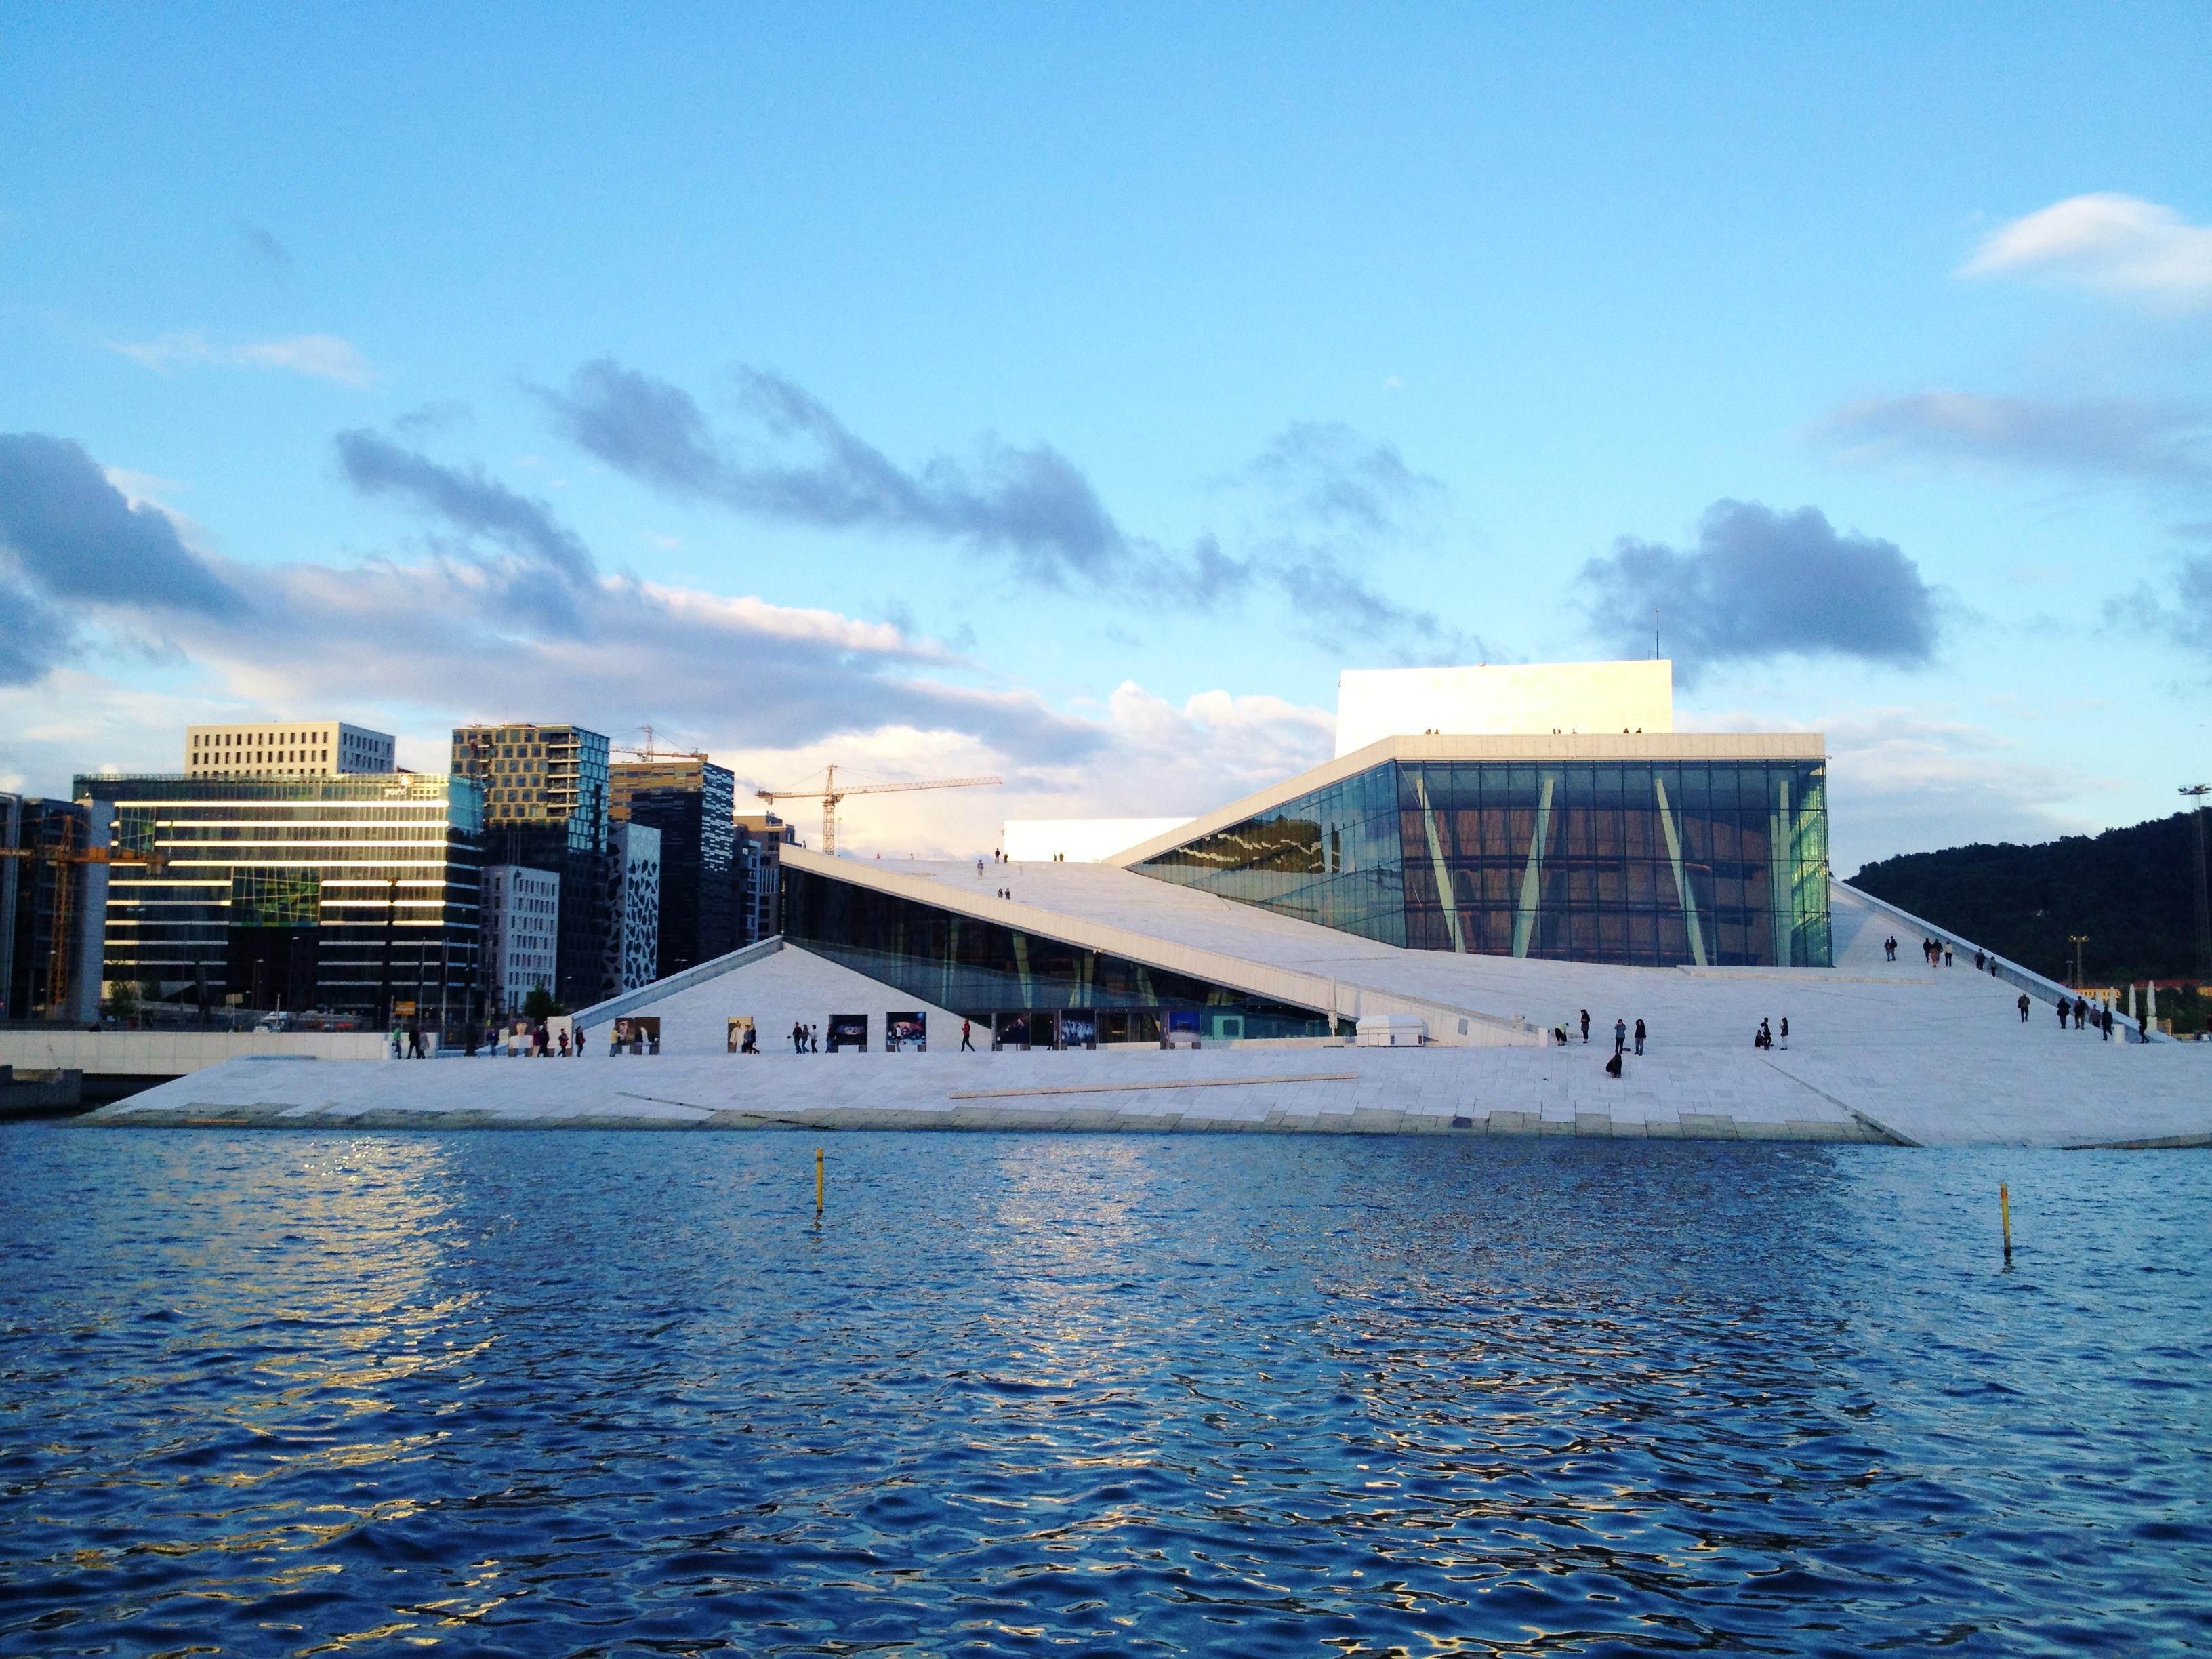 Oslo opera house photo